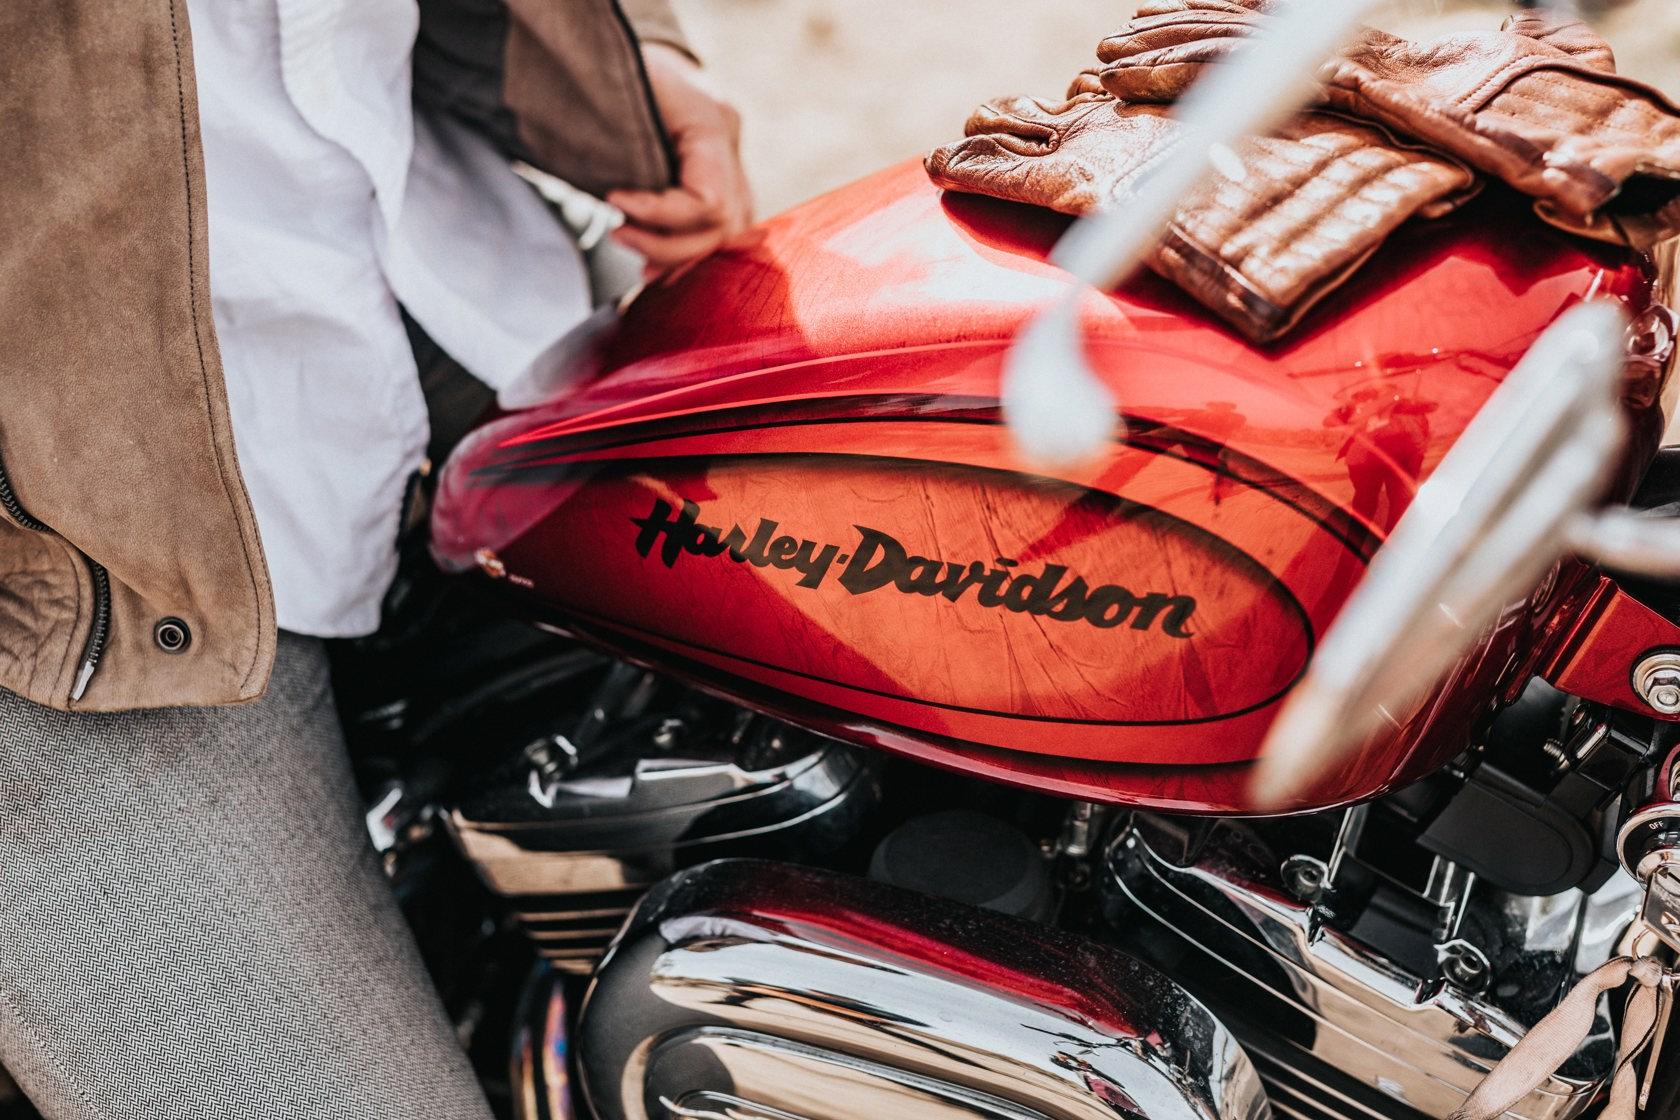 Harley Davidson stock, HOG stock, HOG stock news